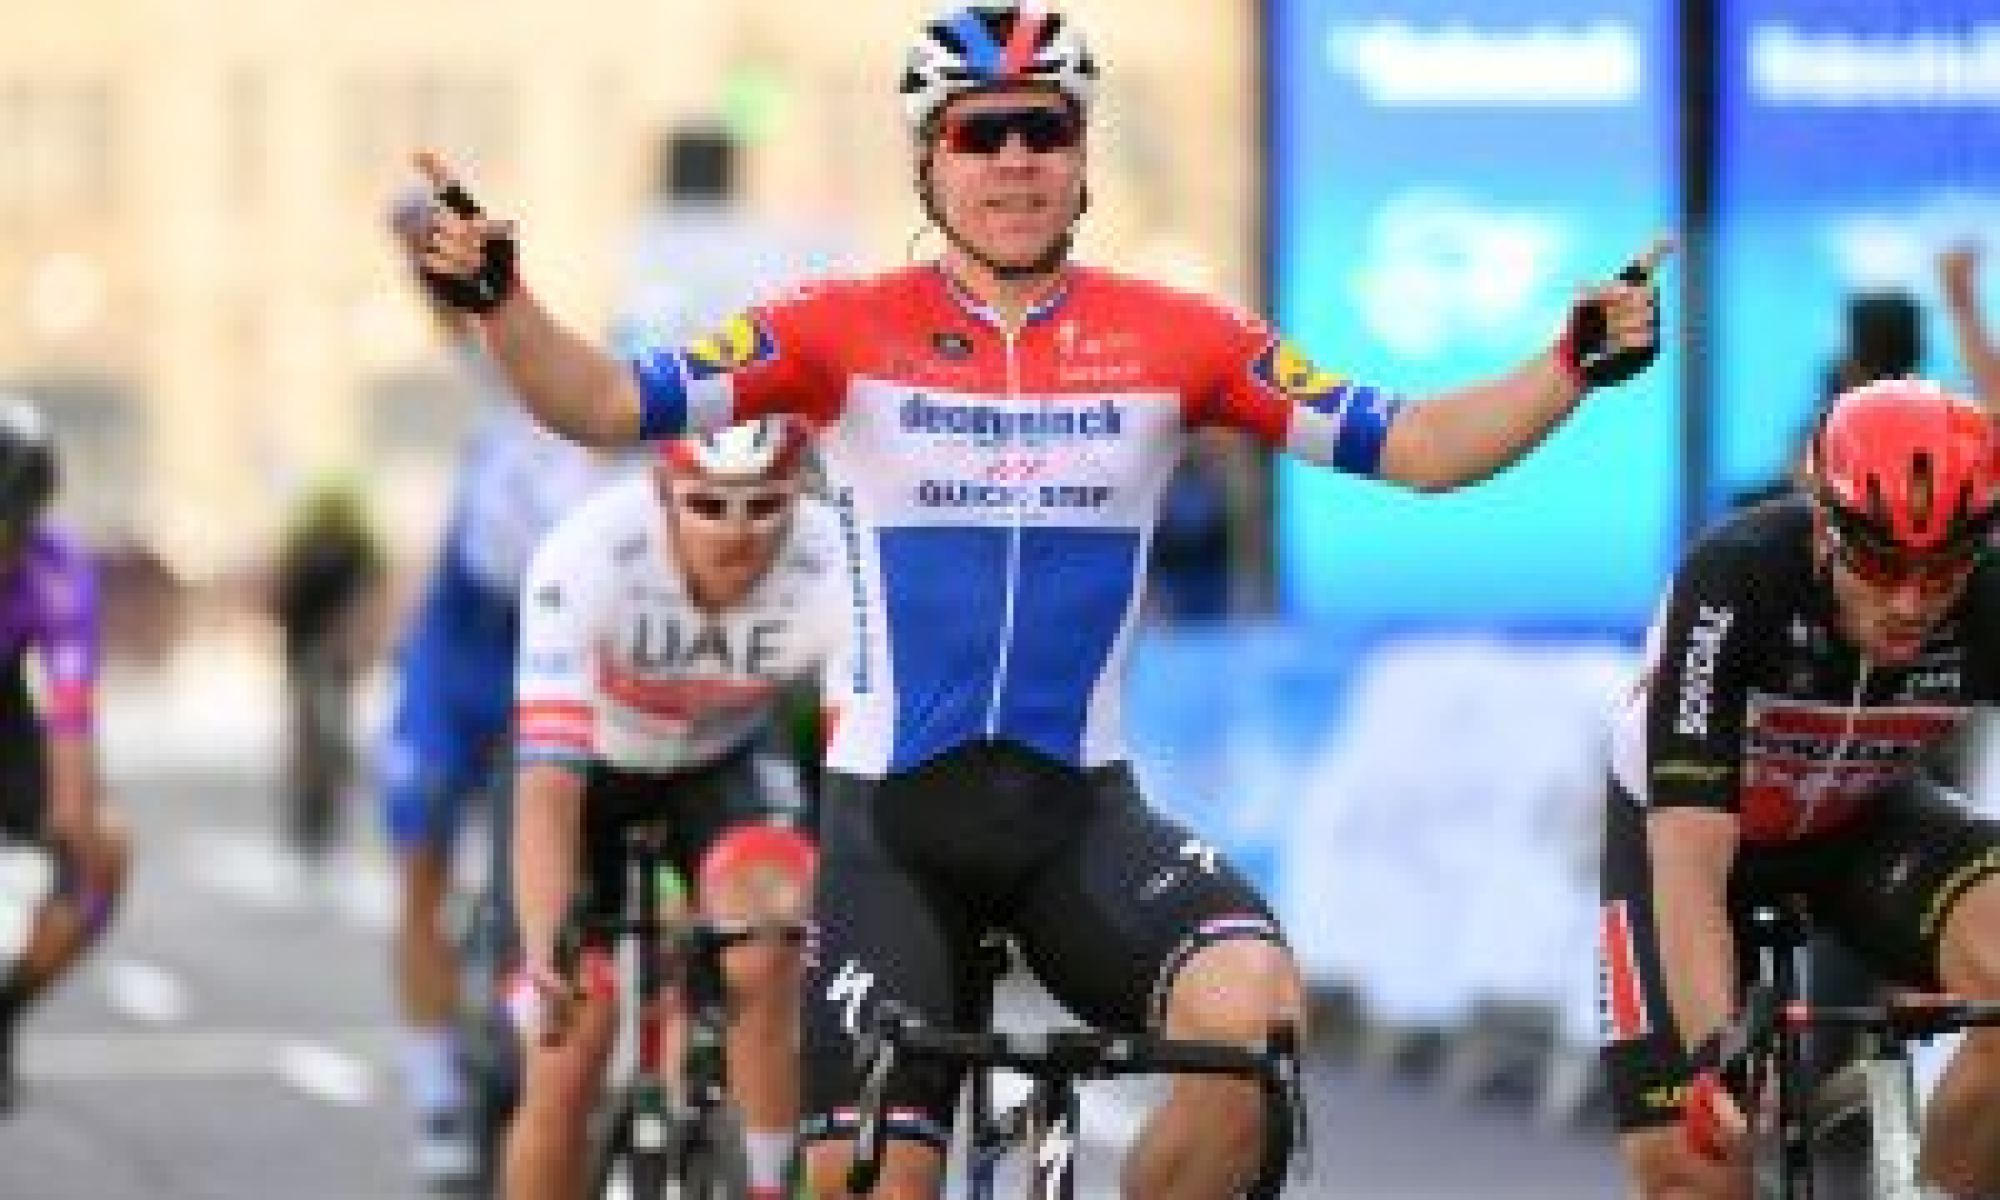 Fabio Jakobsen has facial surgery but remains in an induced coma after Tour of Poland crash